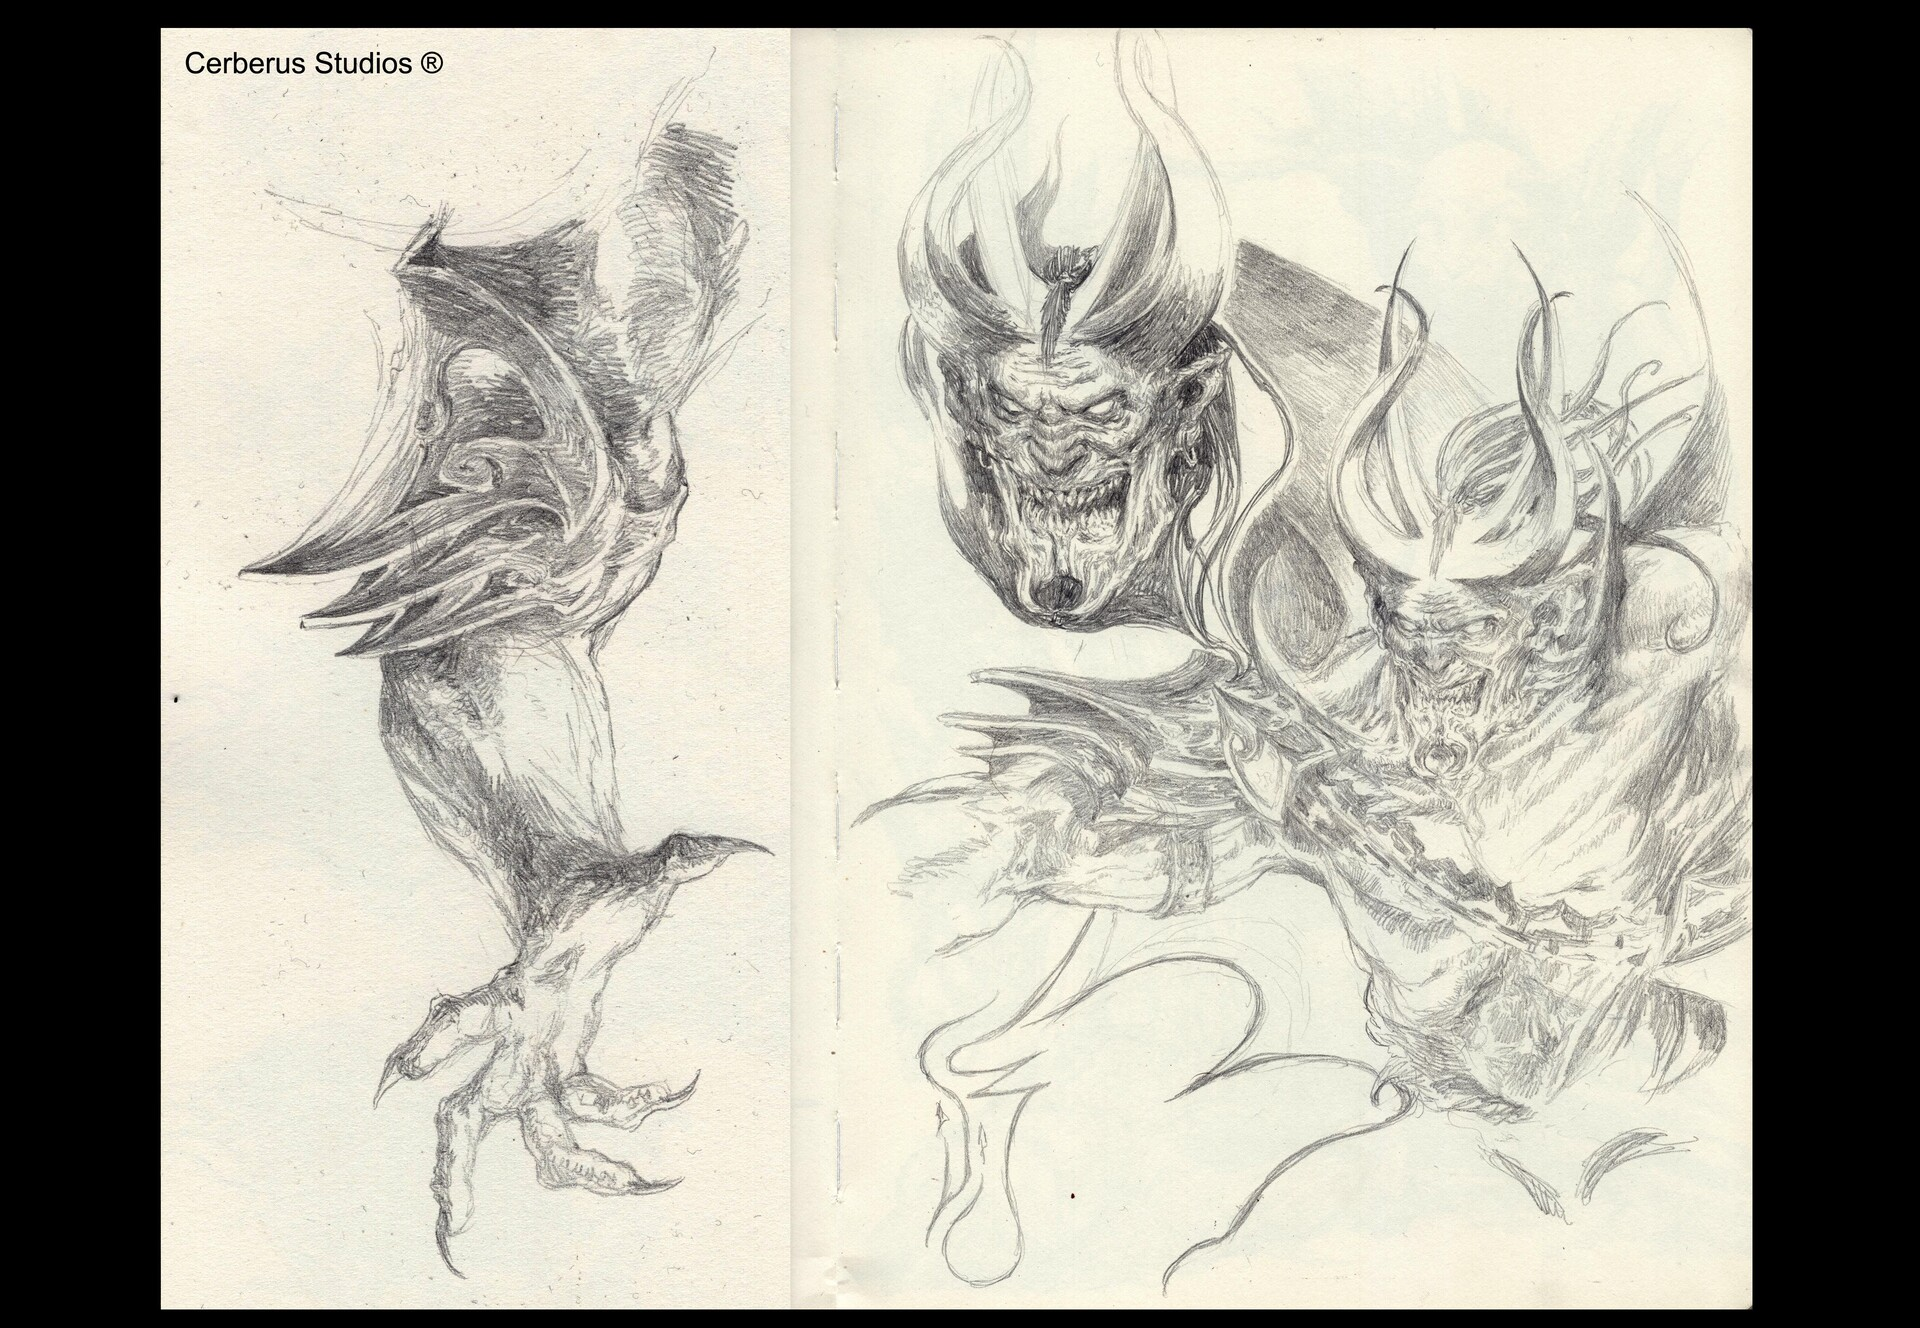 Daniel zrom danielzrom cerberusstudio titans fight sketches